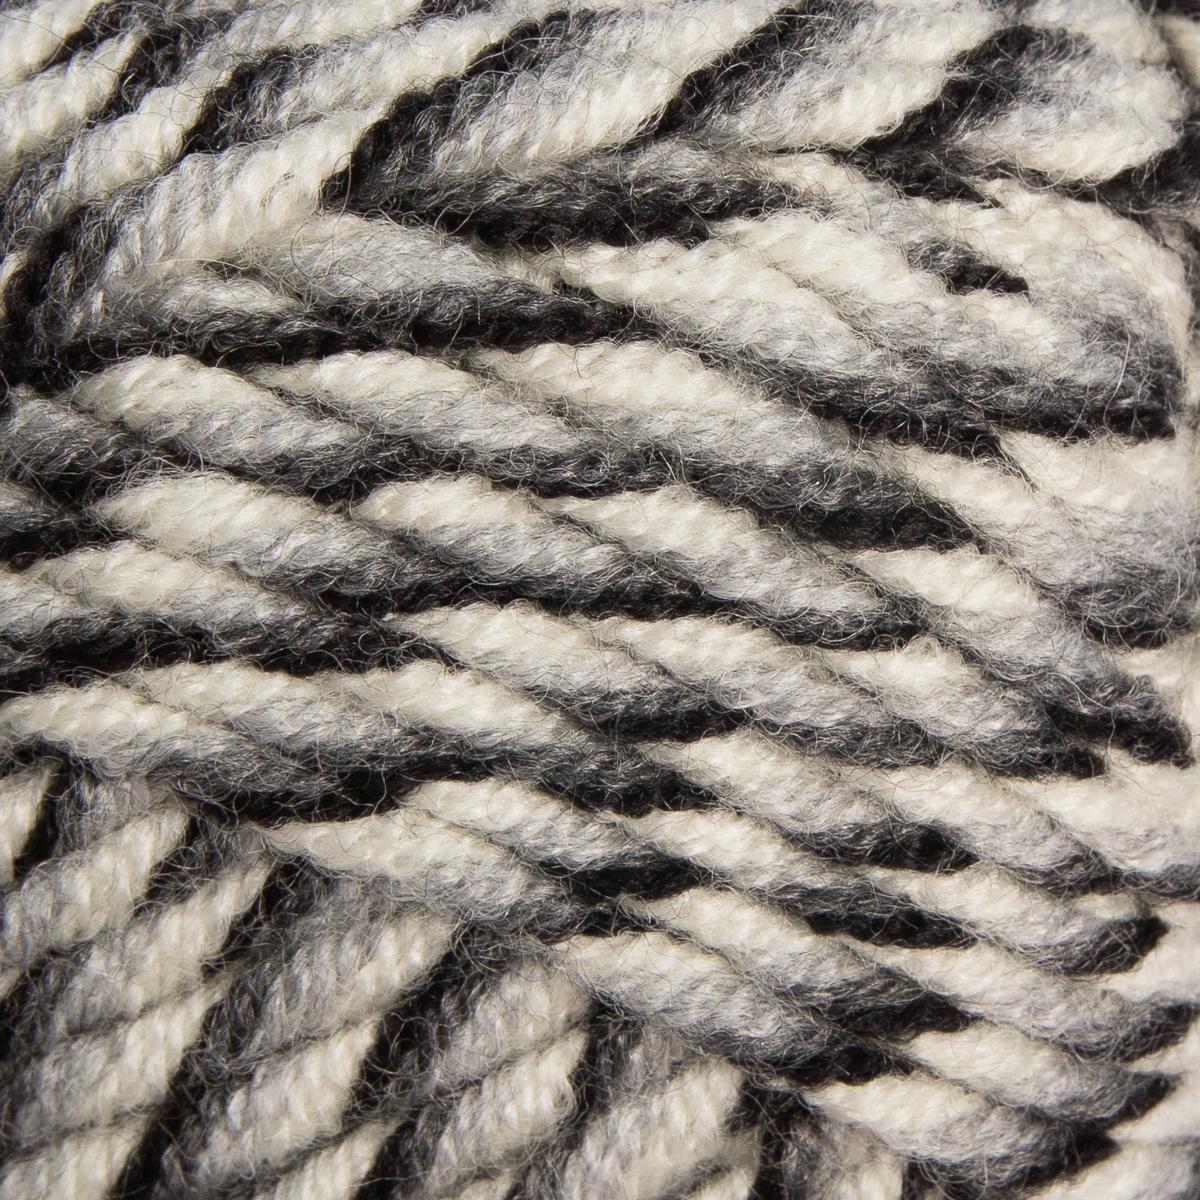 3pk-Lion-Brand-Woolspun-Acrylic-amp-Wool-Yarn-Bulky-5-Knit-Crocheting-Skeins-Soft thumbnail 71